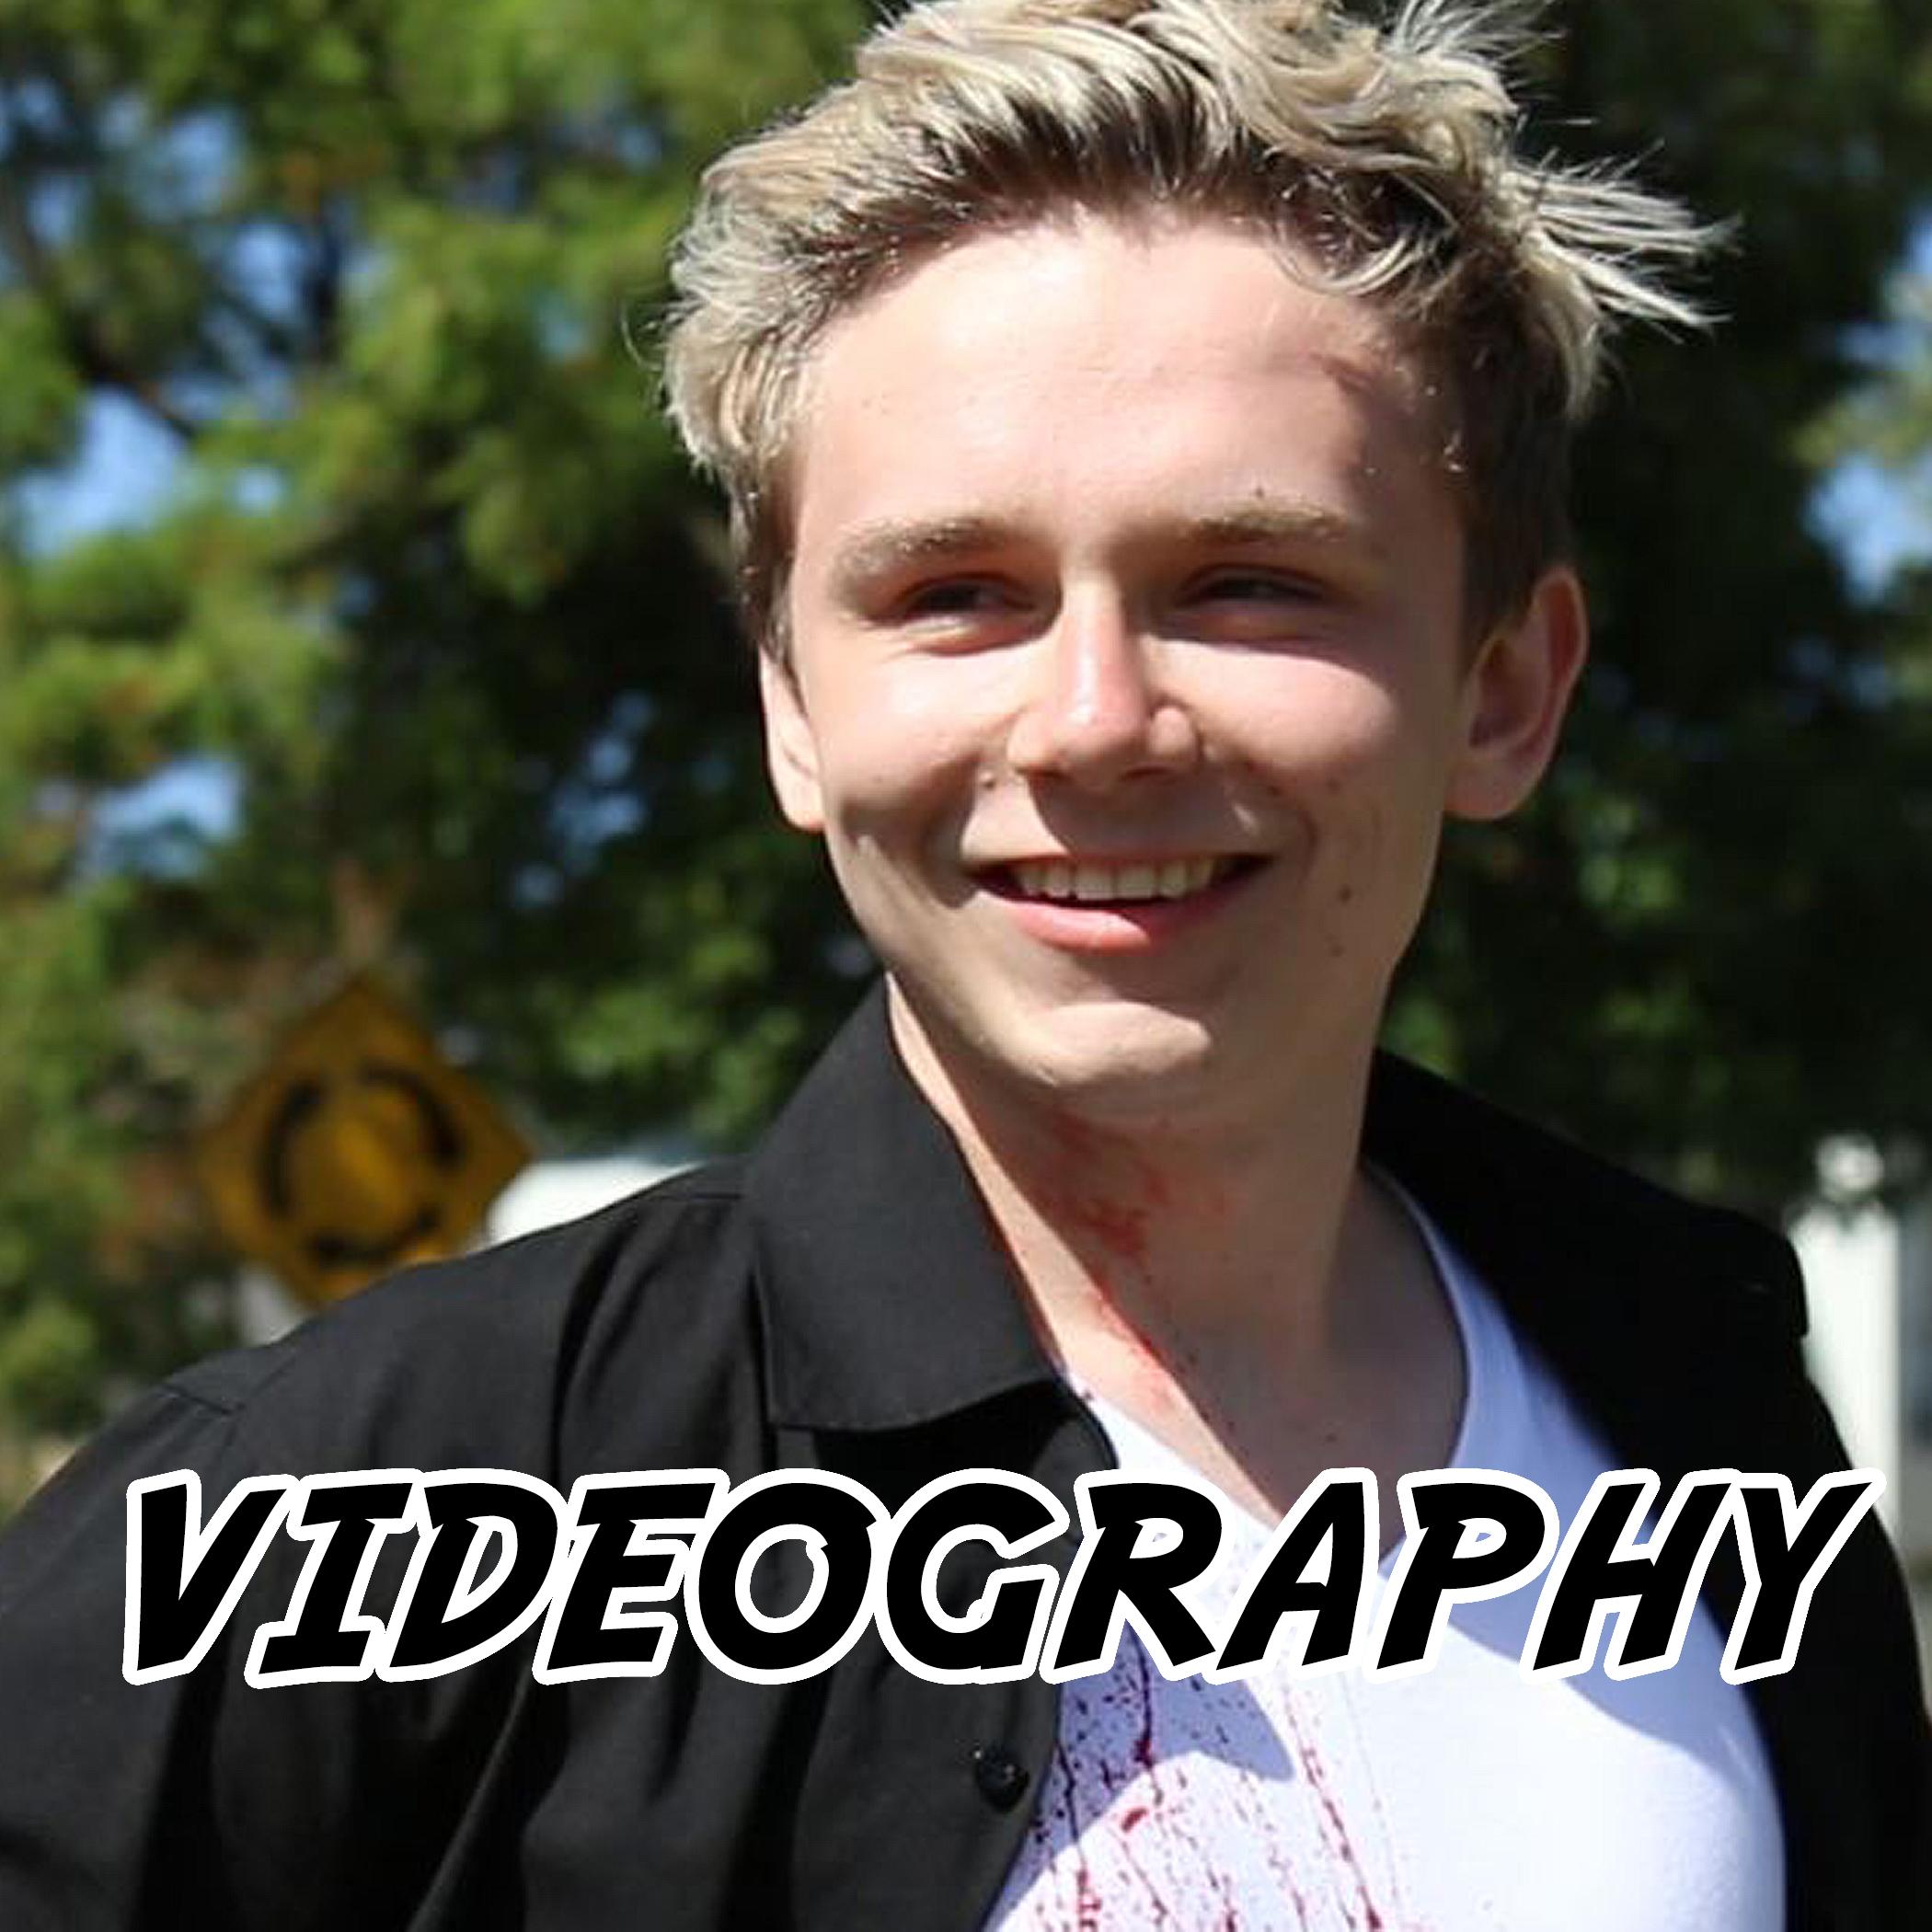 Videography.jpg